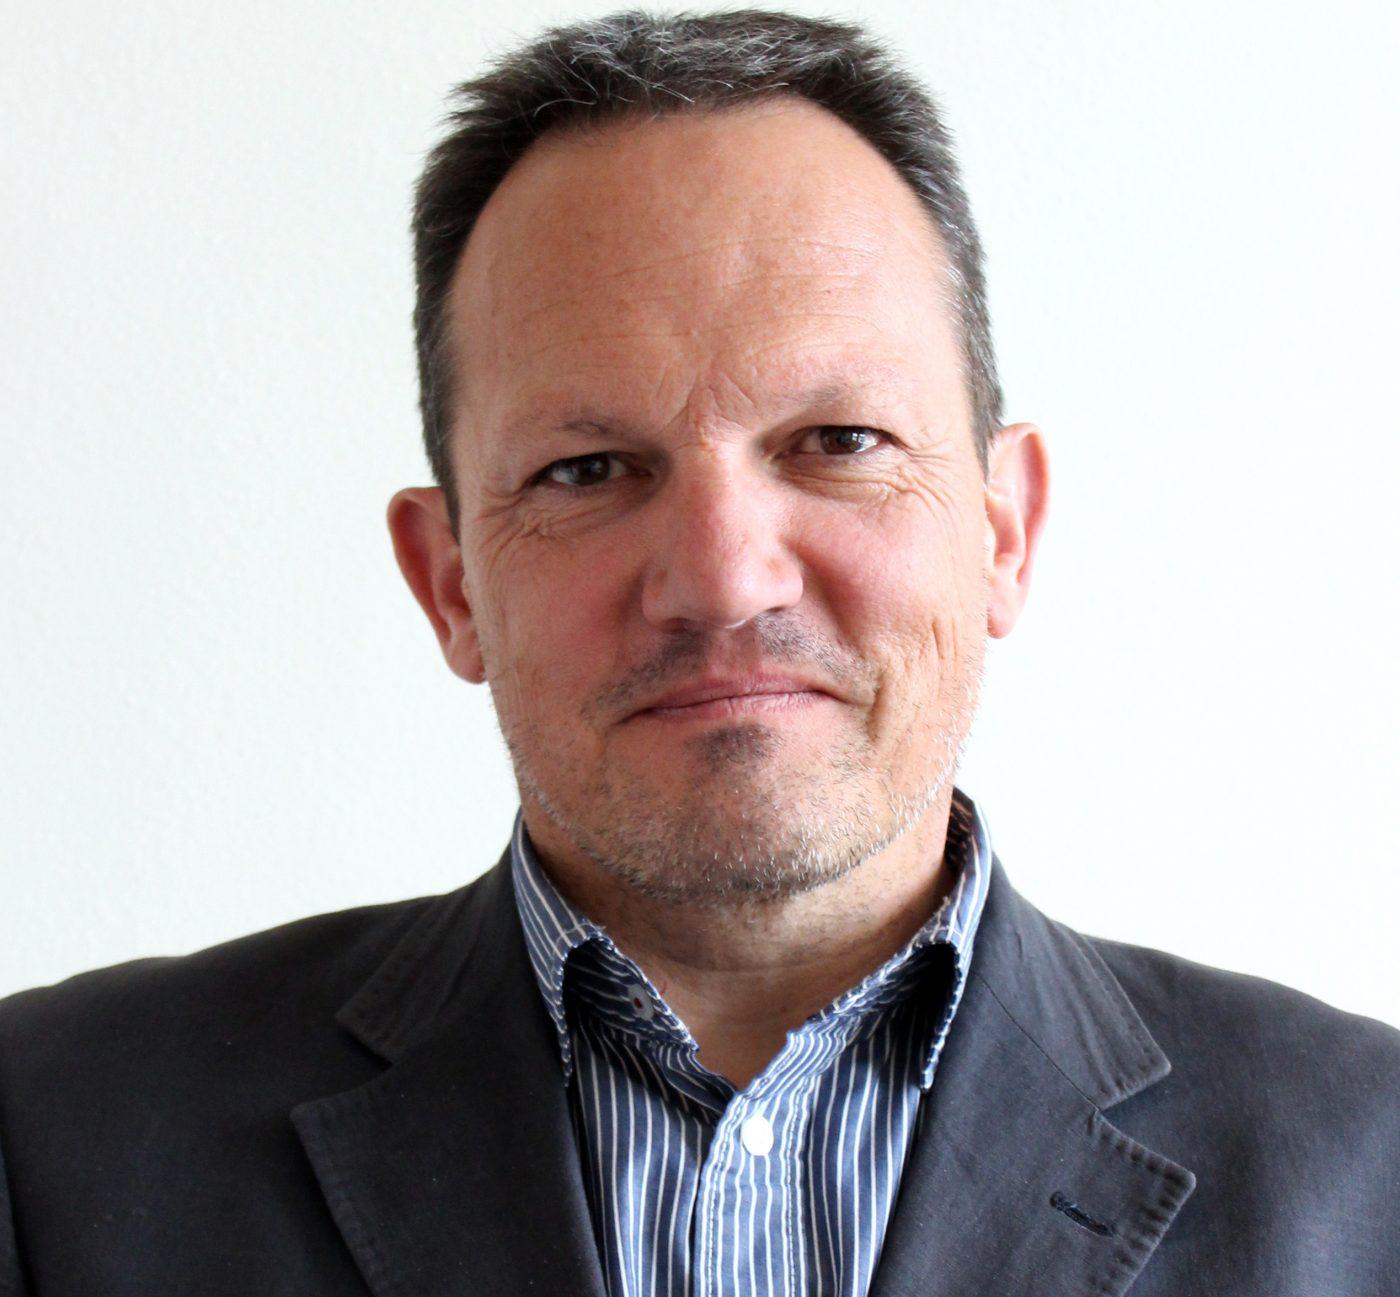 Olivier Hauglustaine